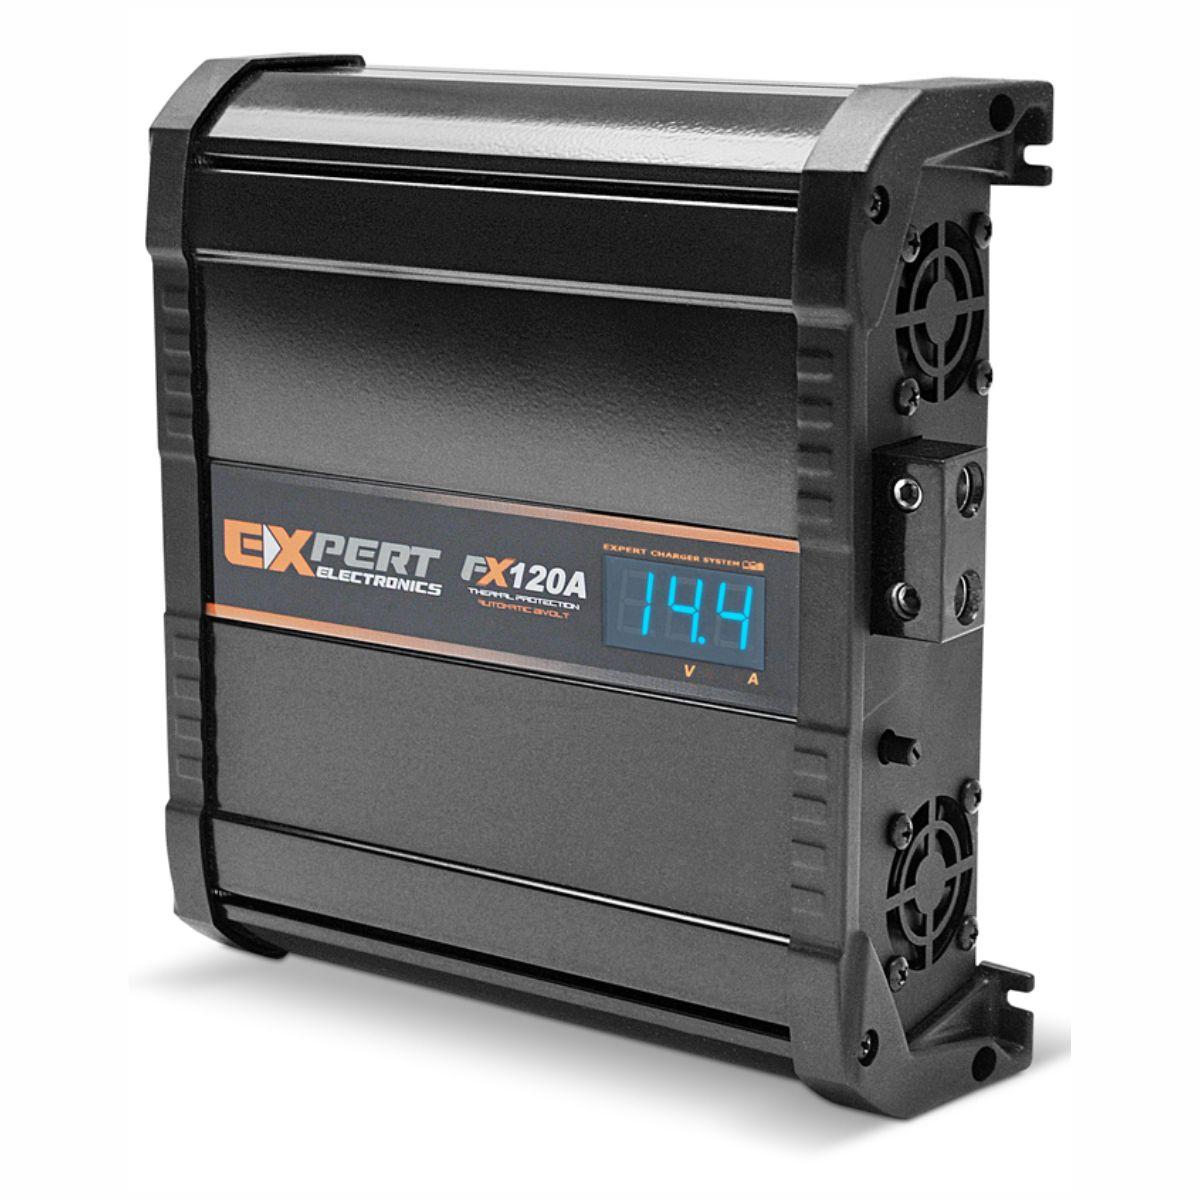 Fonte e Carregador Expert FX120A 120 Amperes 12 Volts com Voltímetro e Amperímetro Bivolt